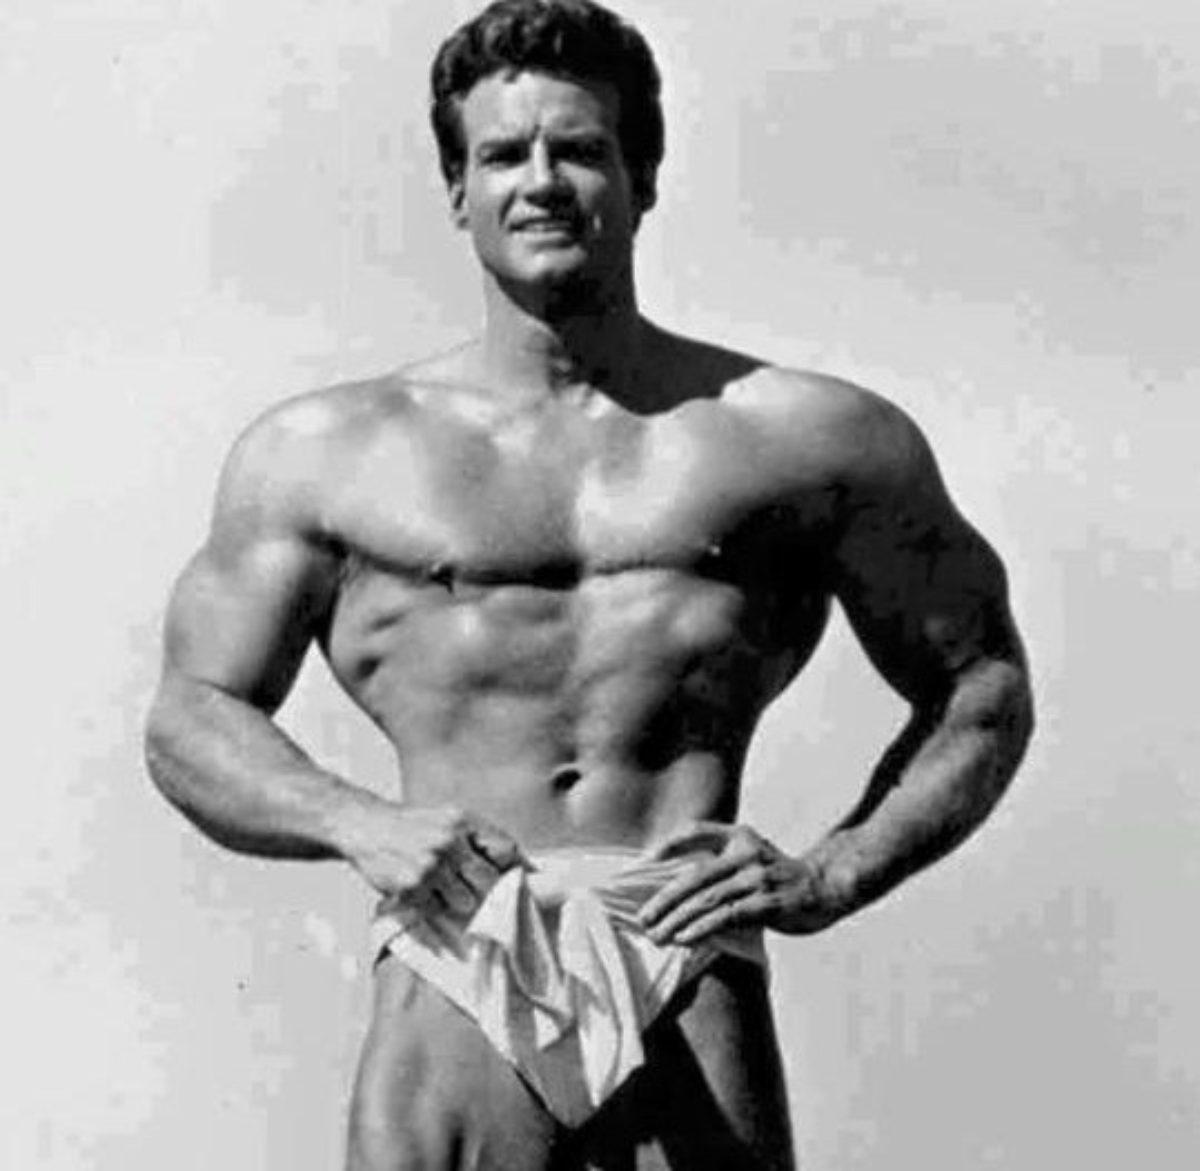 what was a silver era bodybuilders diet like